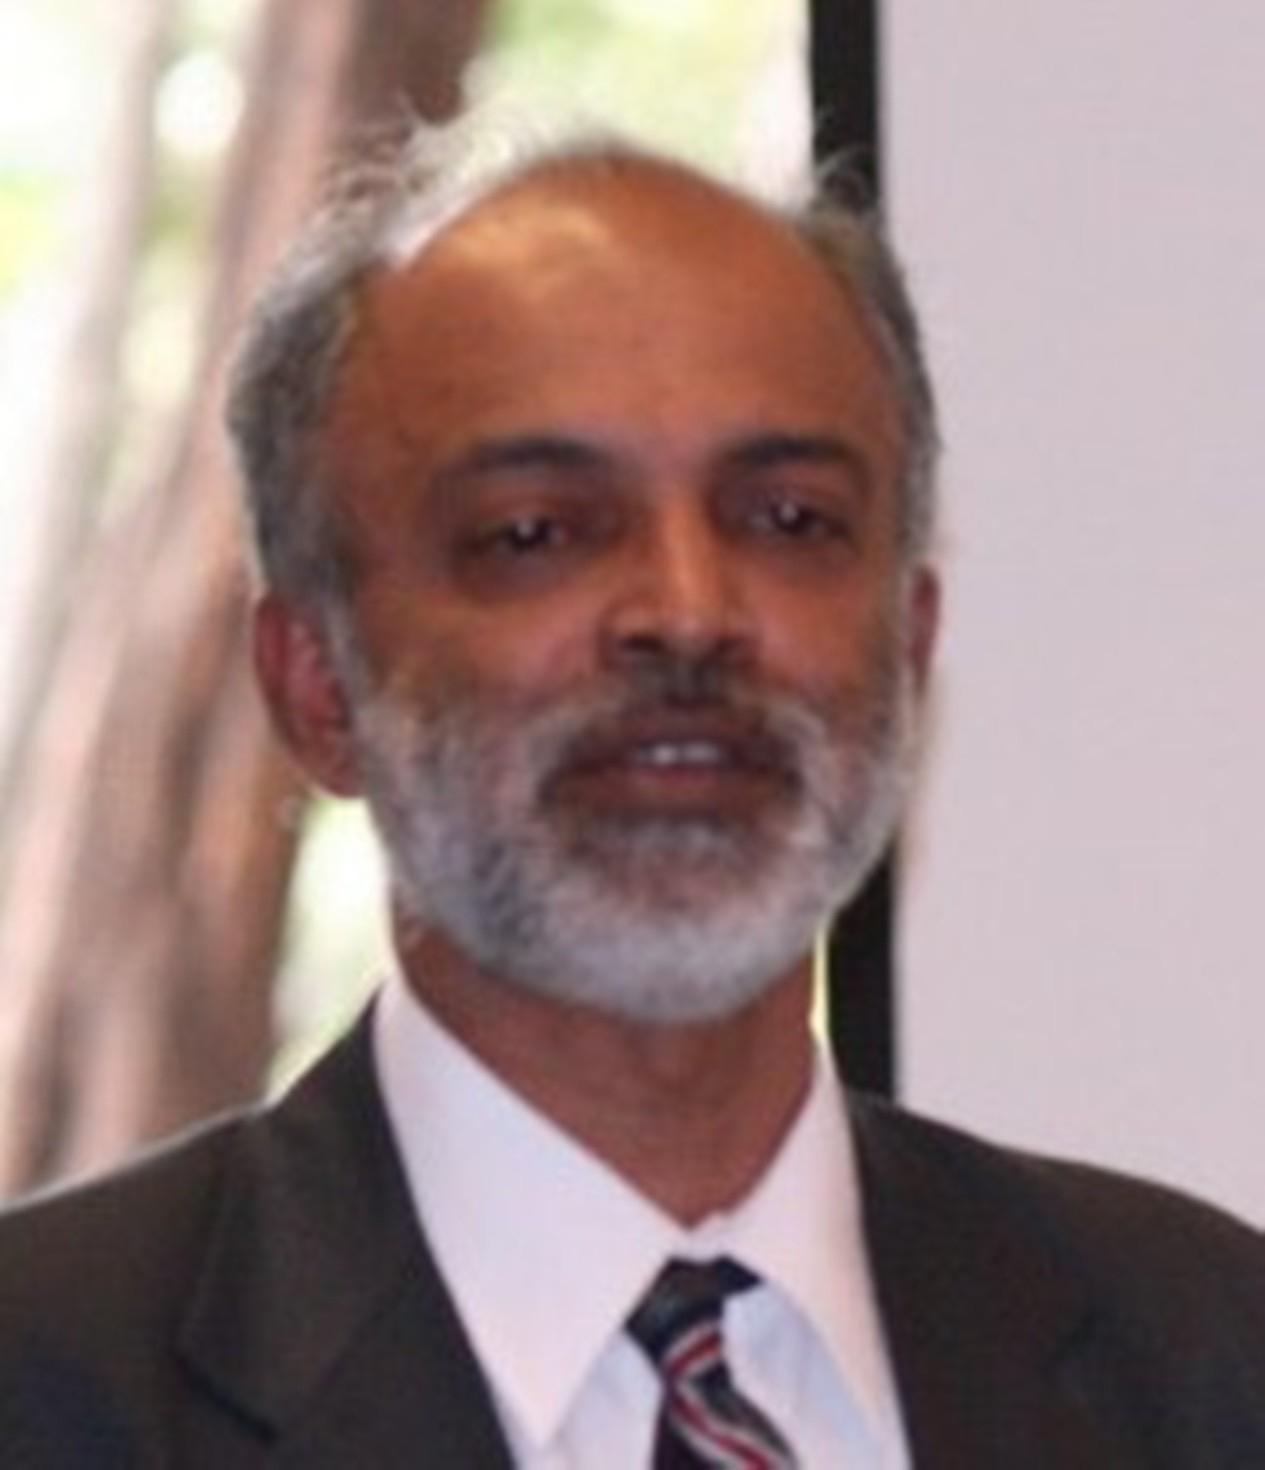 Profile image of Pandit, Prof. Aniruddha Bhalachandra